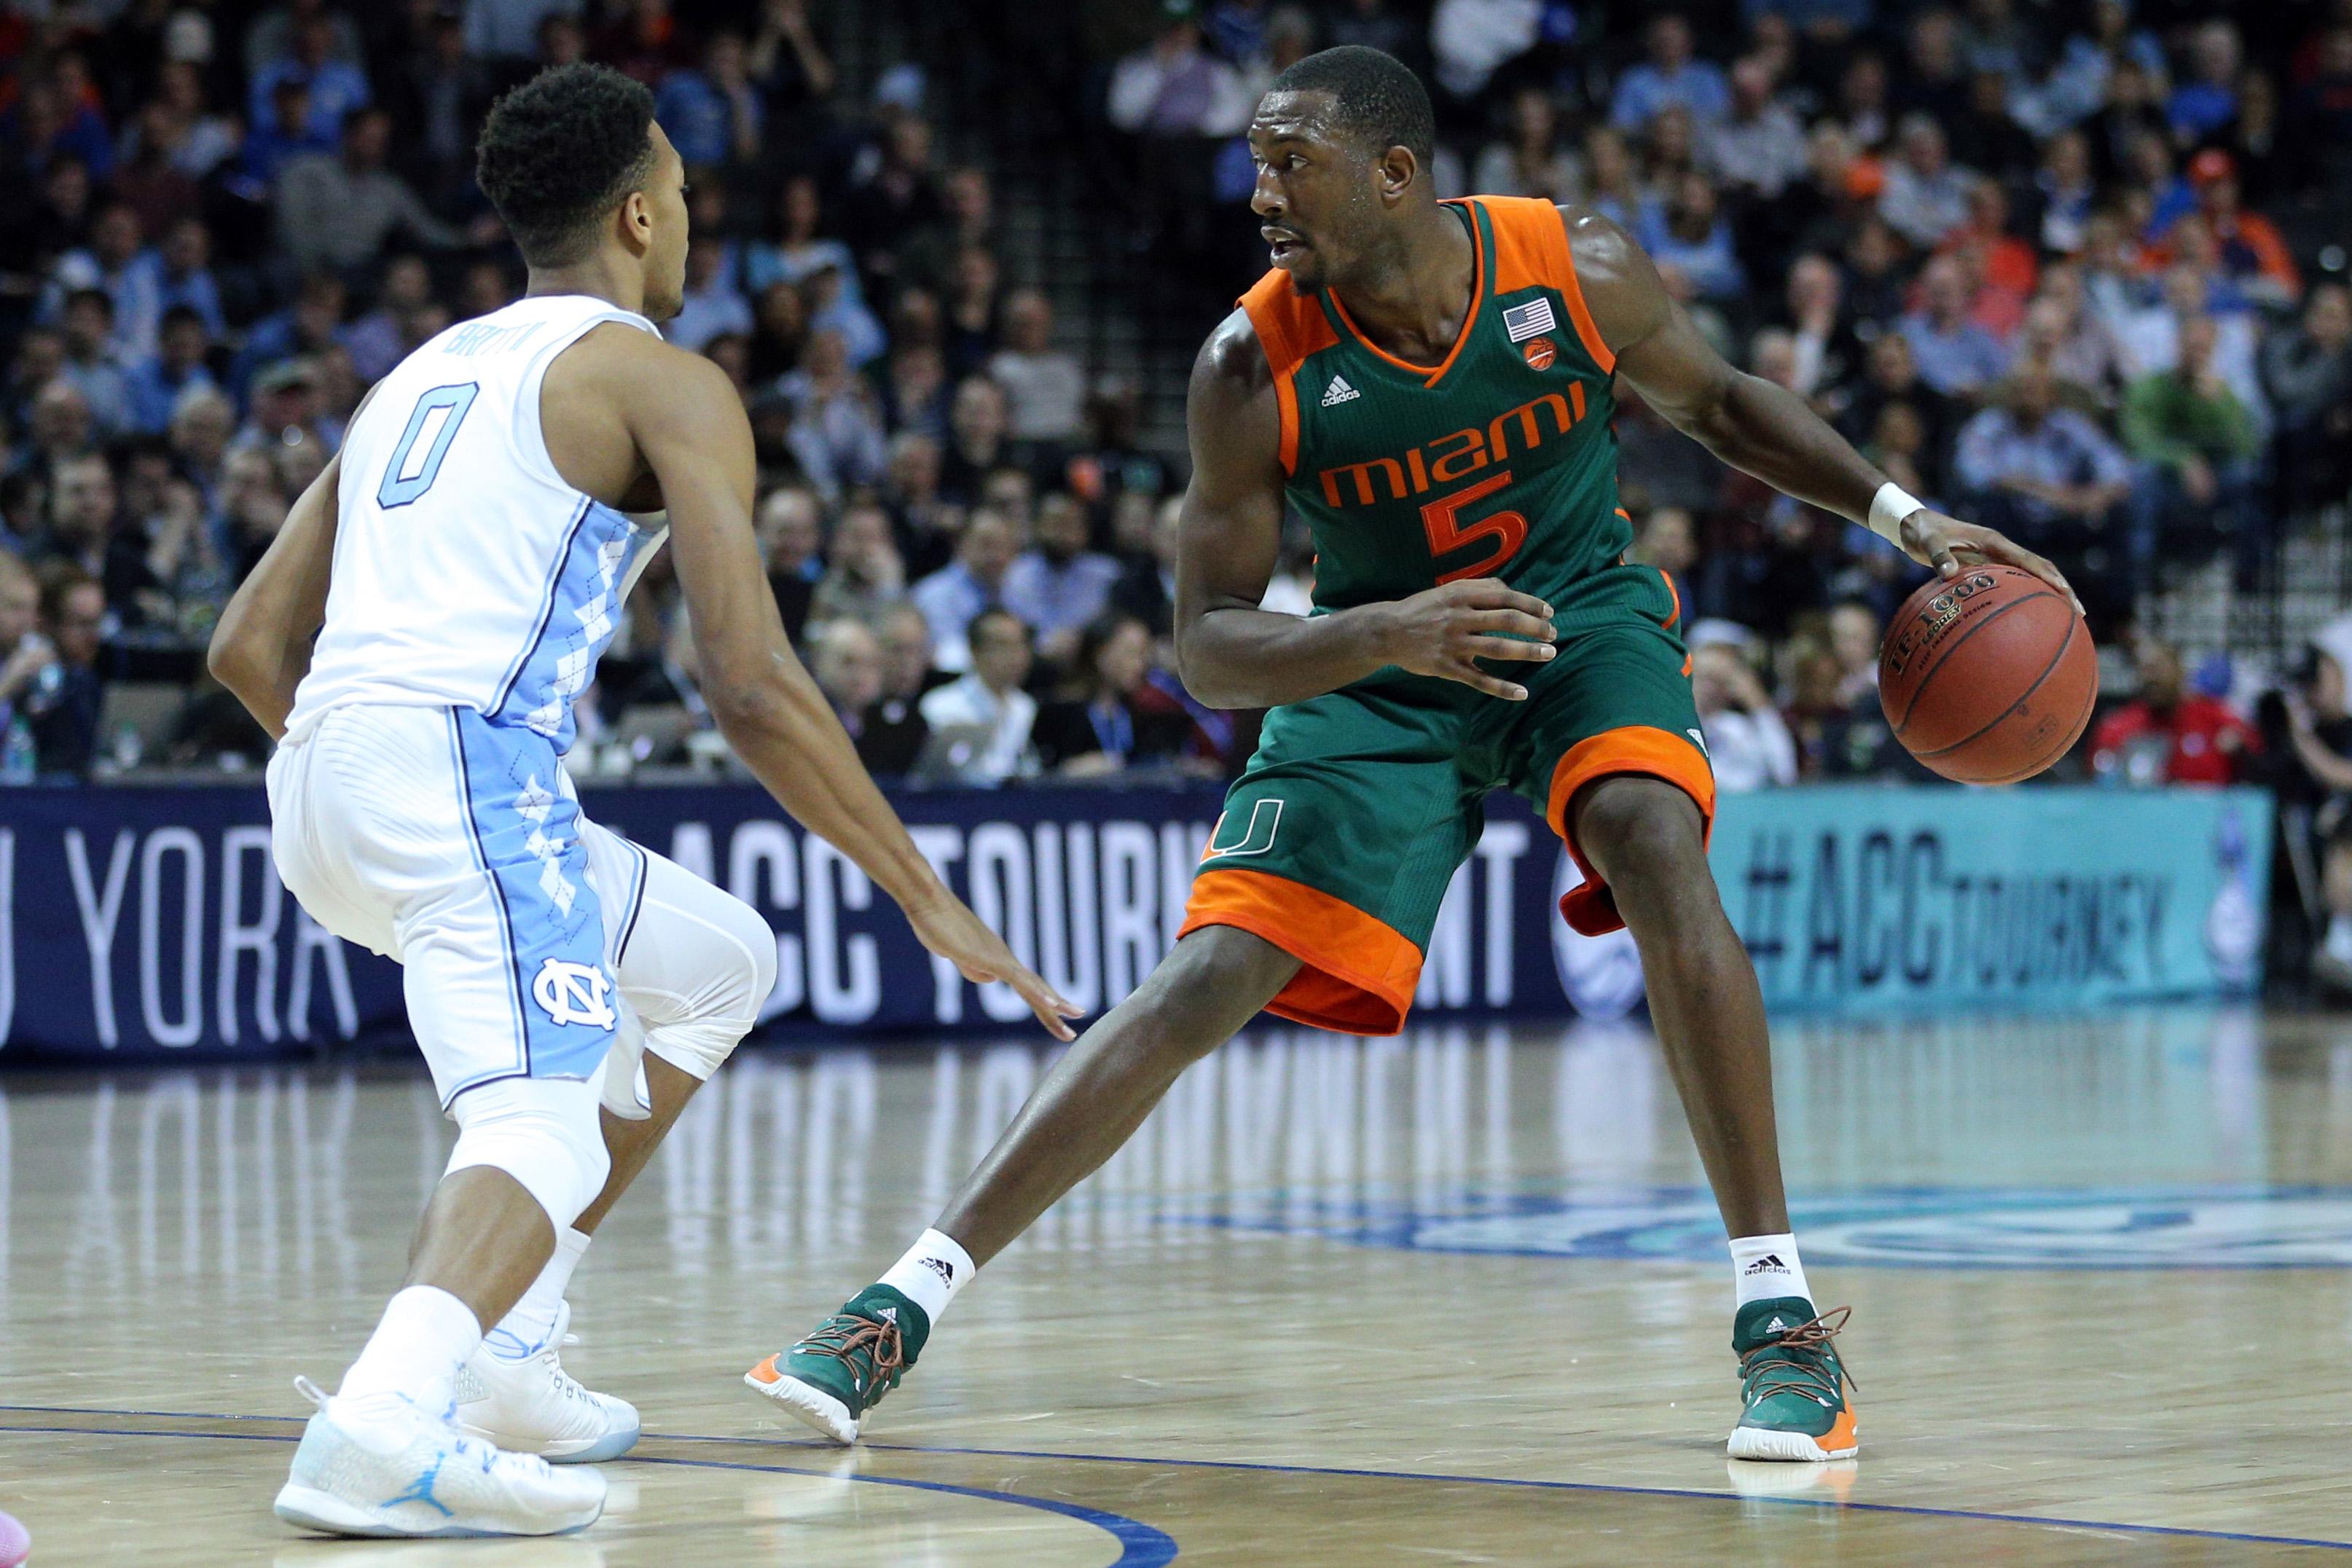 9927638-ncaa-basketball-acc-conference-tournament-north-carolina-vs-miami